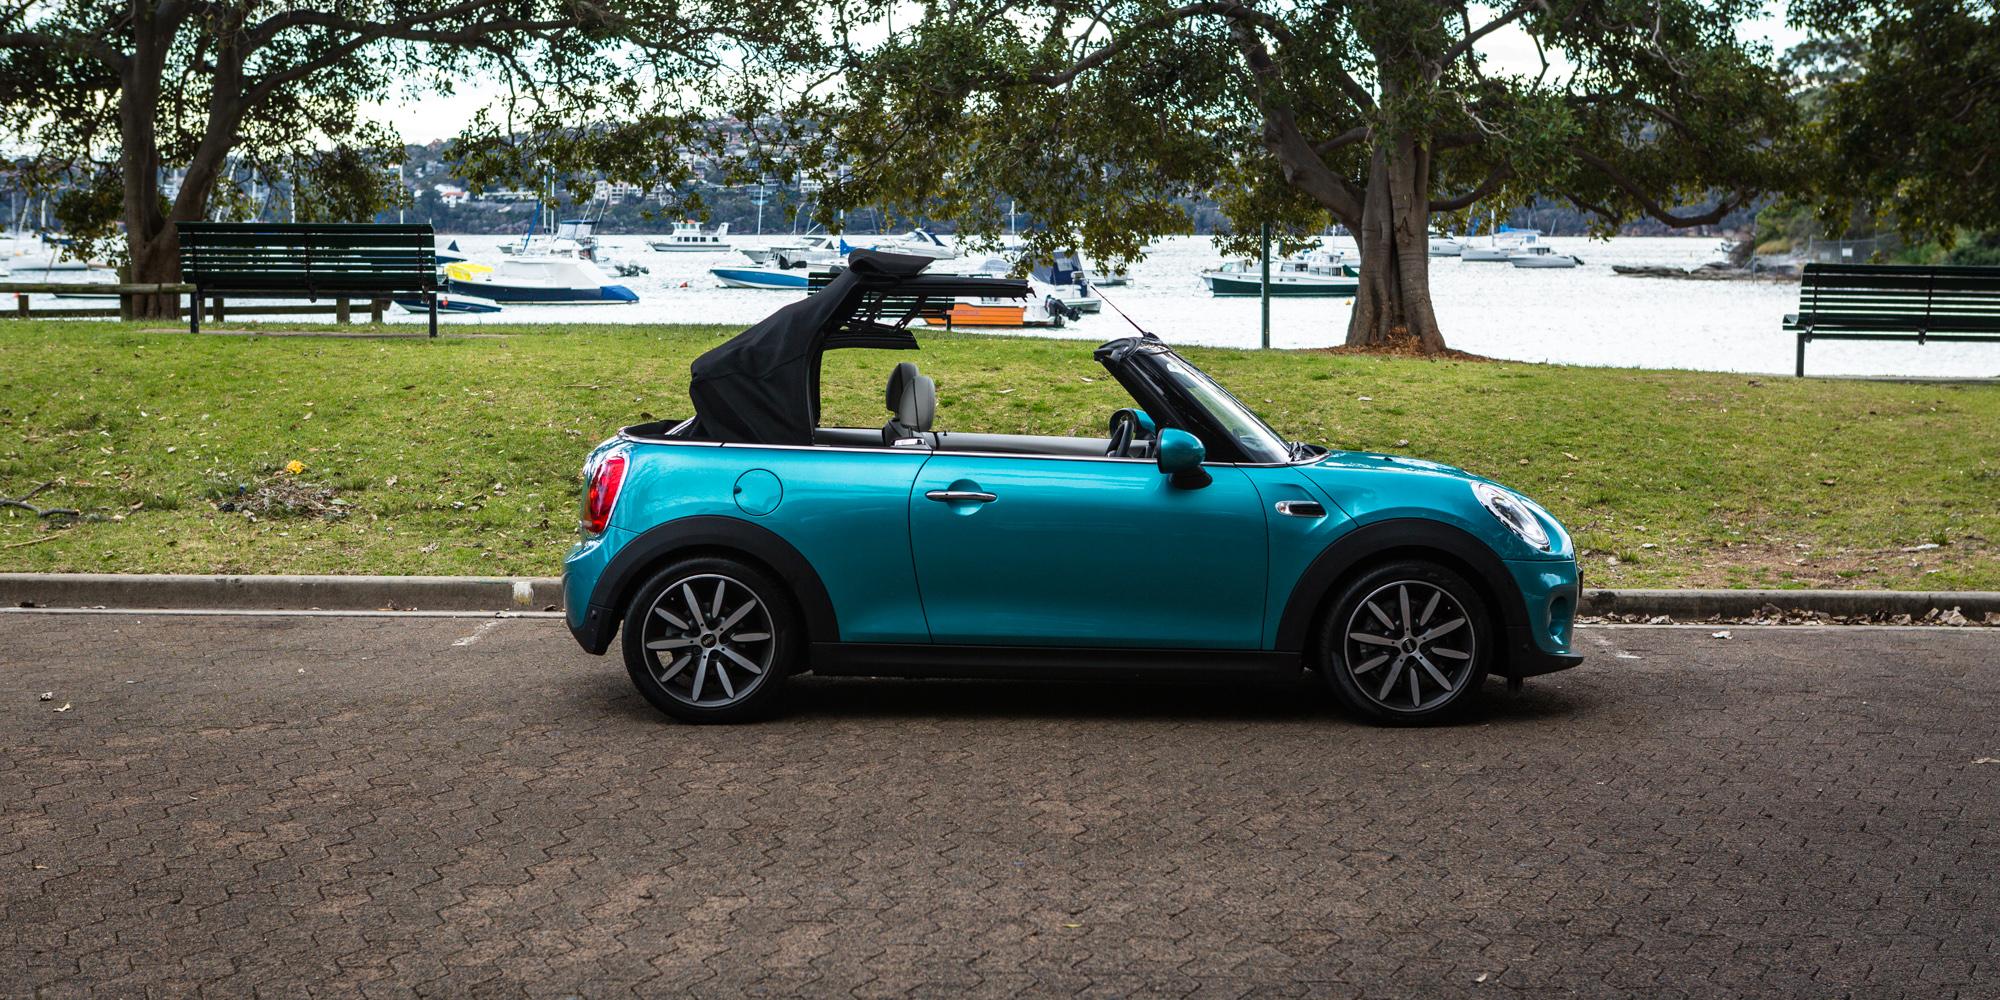 2016 mini cooper convertible review photos caradvice. Black Bedroom Furniture Sets. Home Design Ideas